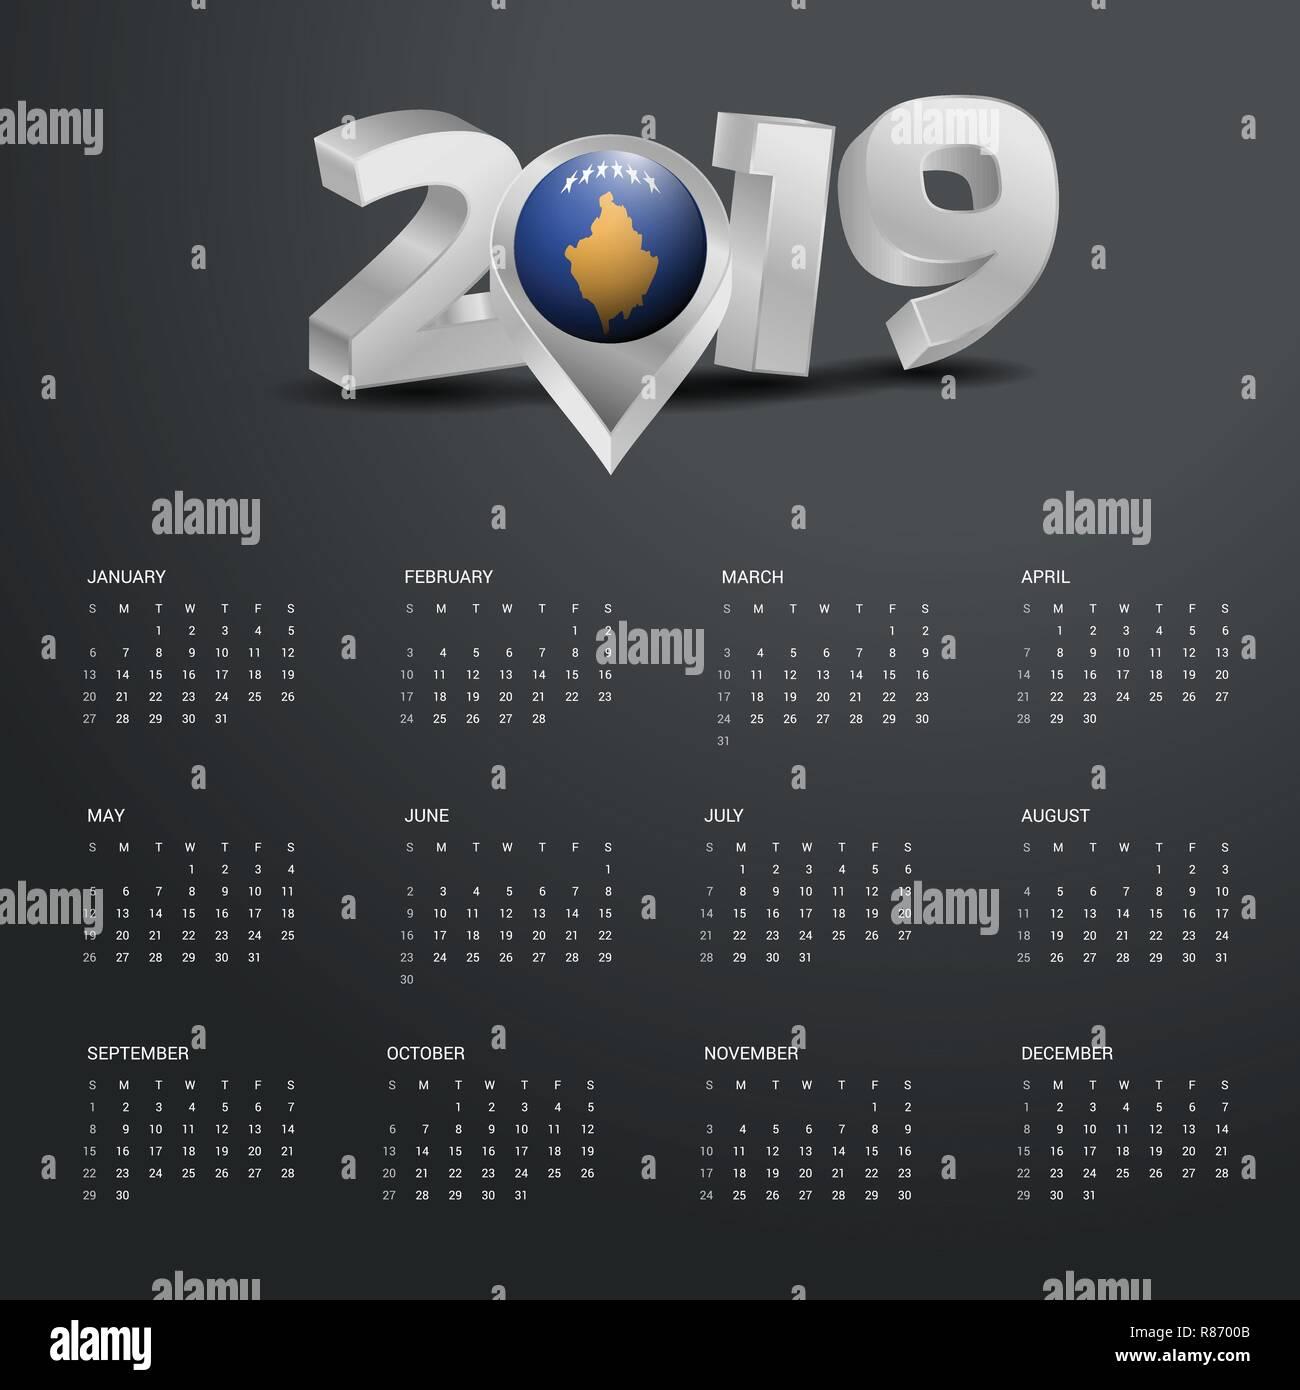 Kosovo Karte 2019.2019 Vorlage Kalender Grau Typografie Mit Kosovo Land Karte Golden